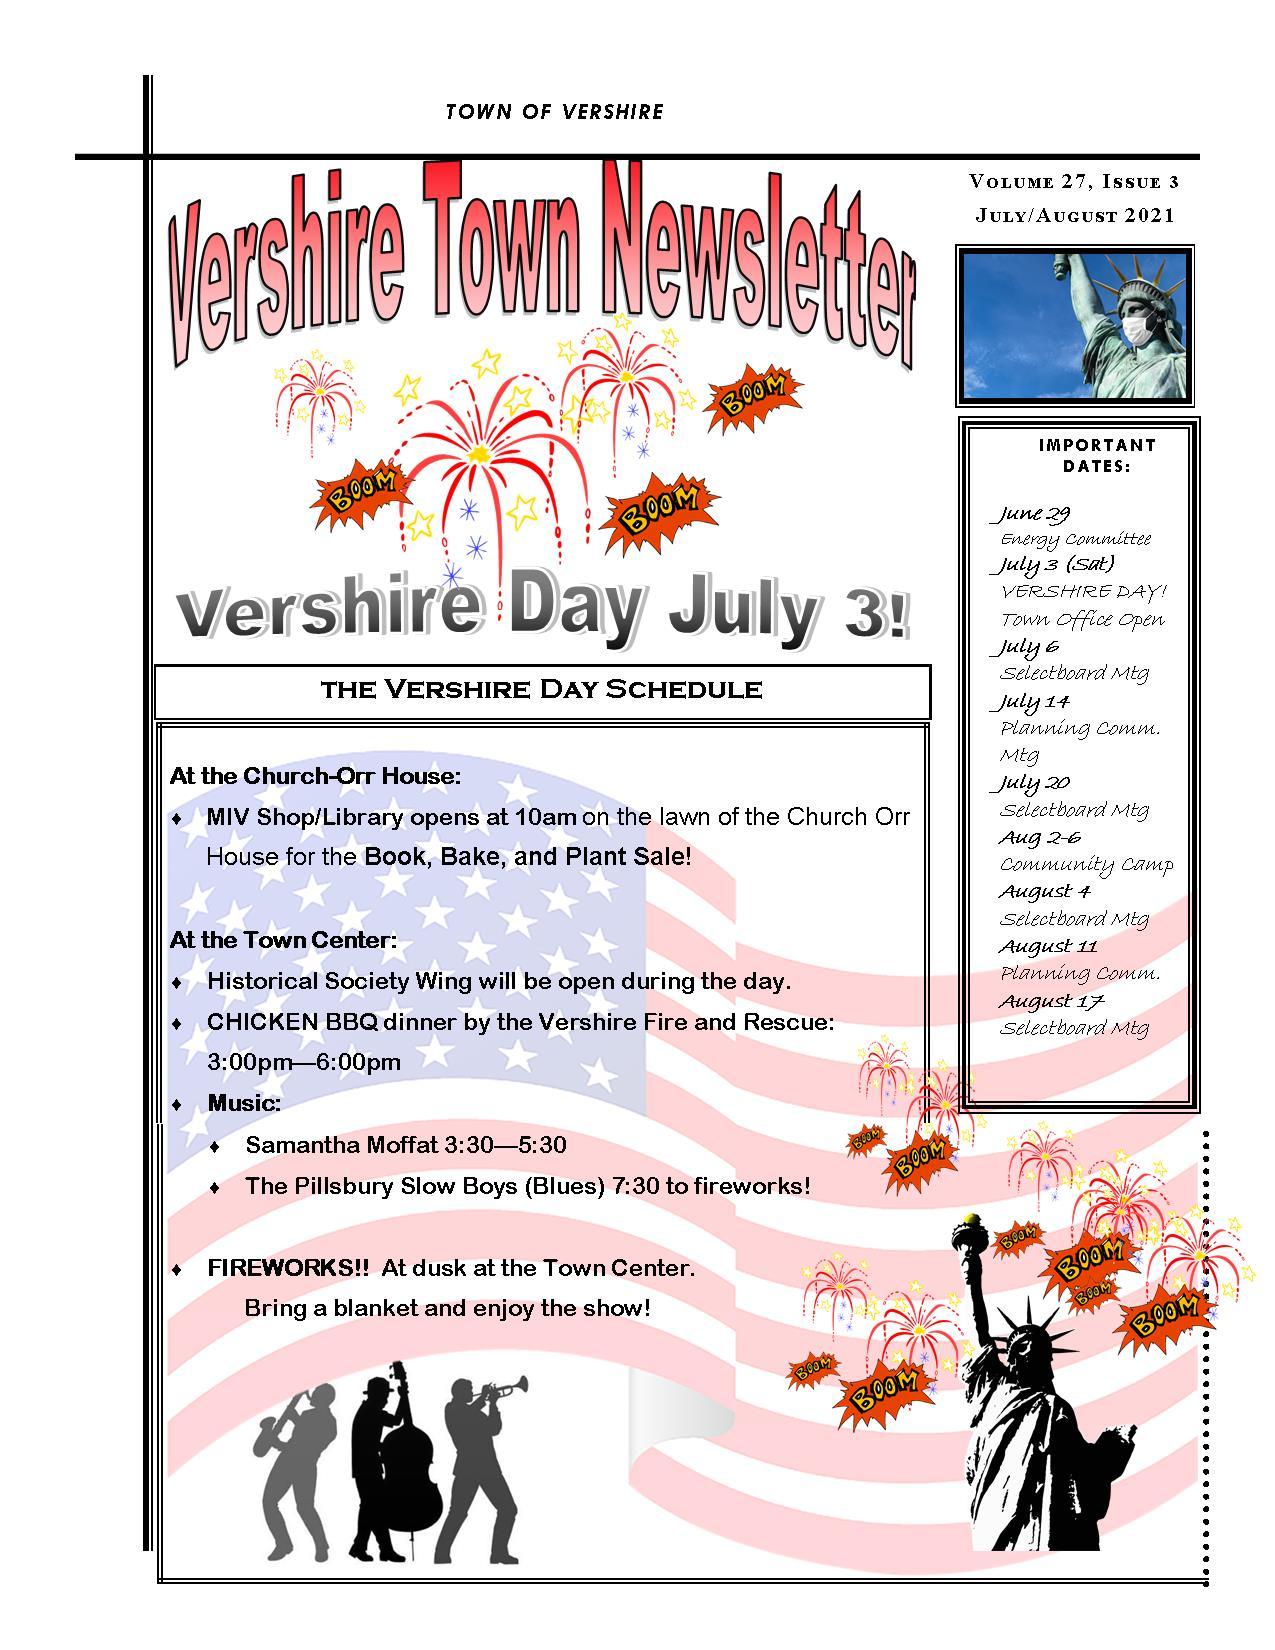 Vershire Day Schedule